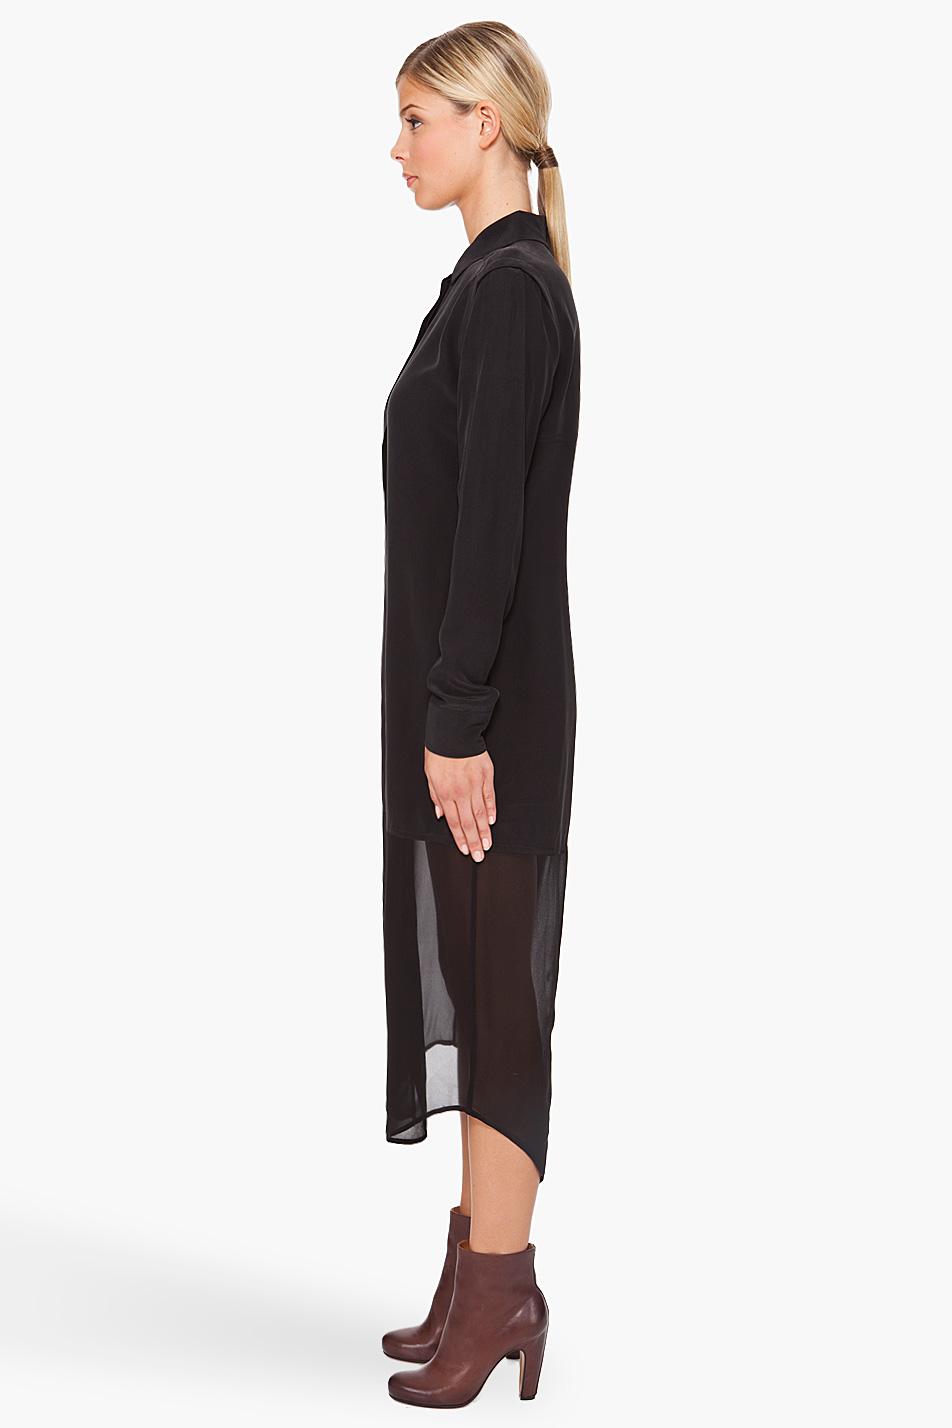 7d4f0595c868 Lyst - T By Alexander Wang Half-sheer Shirt Dress in Black